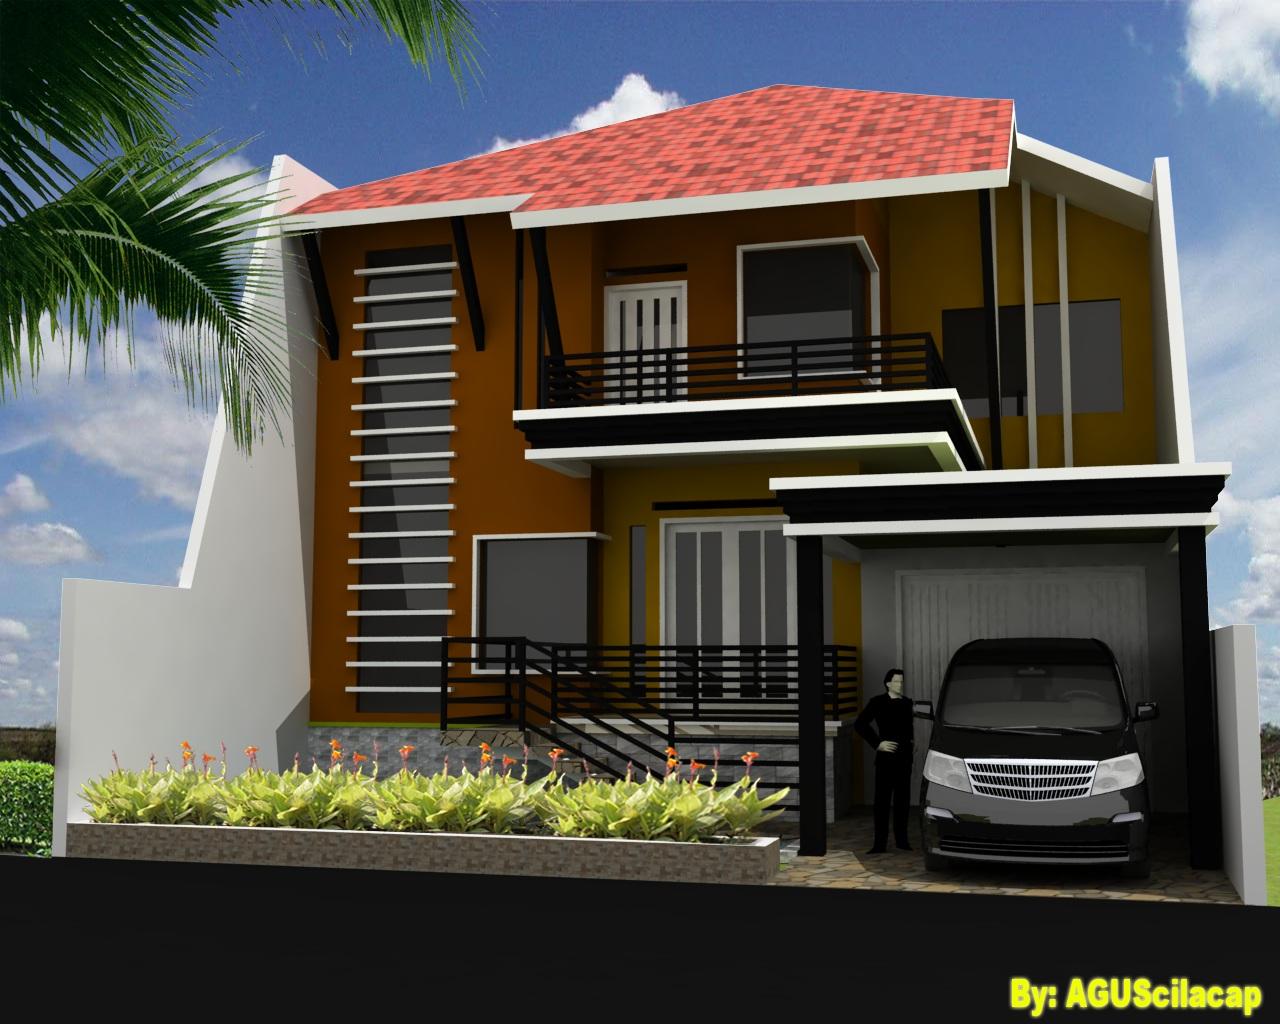 Contoh Desain Rumah Modern Minimalis Kumpulan Gambar Rumah